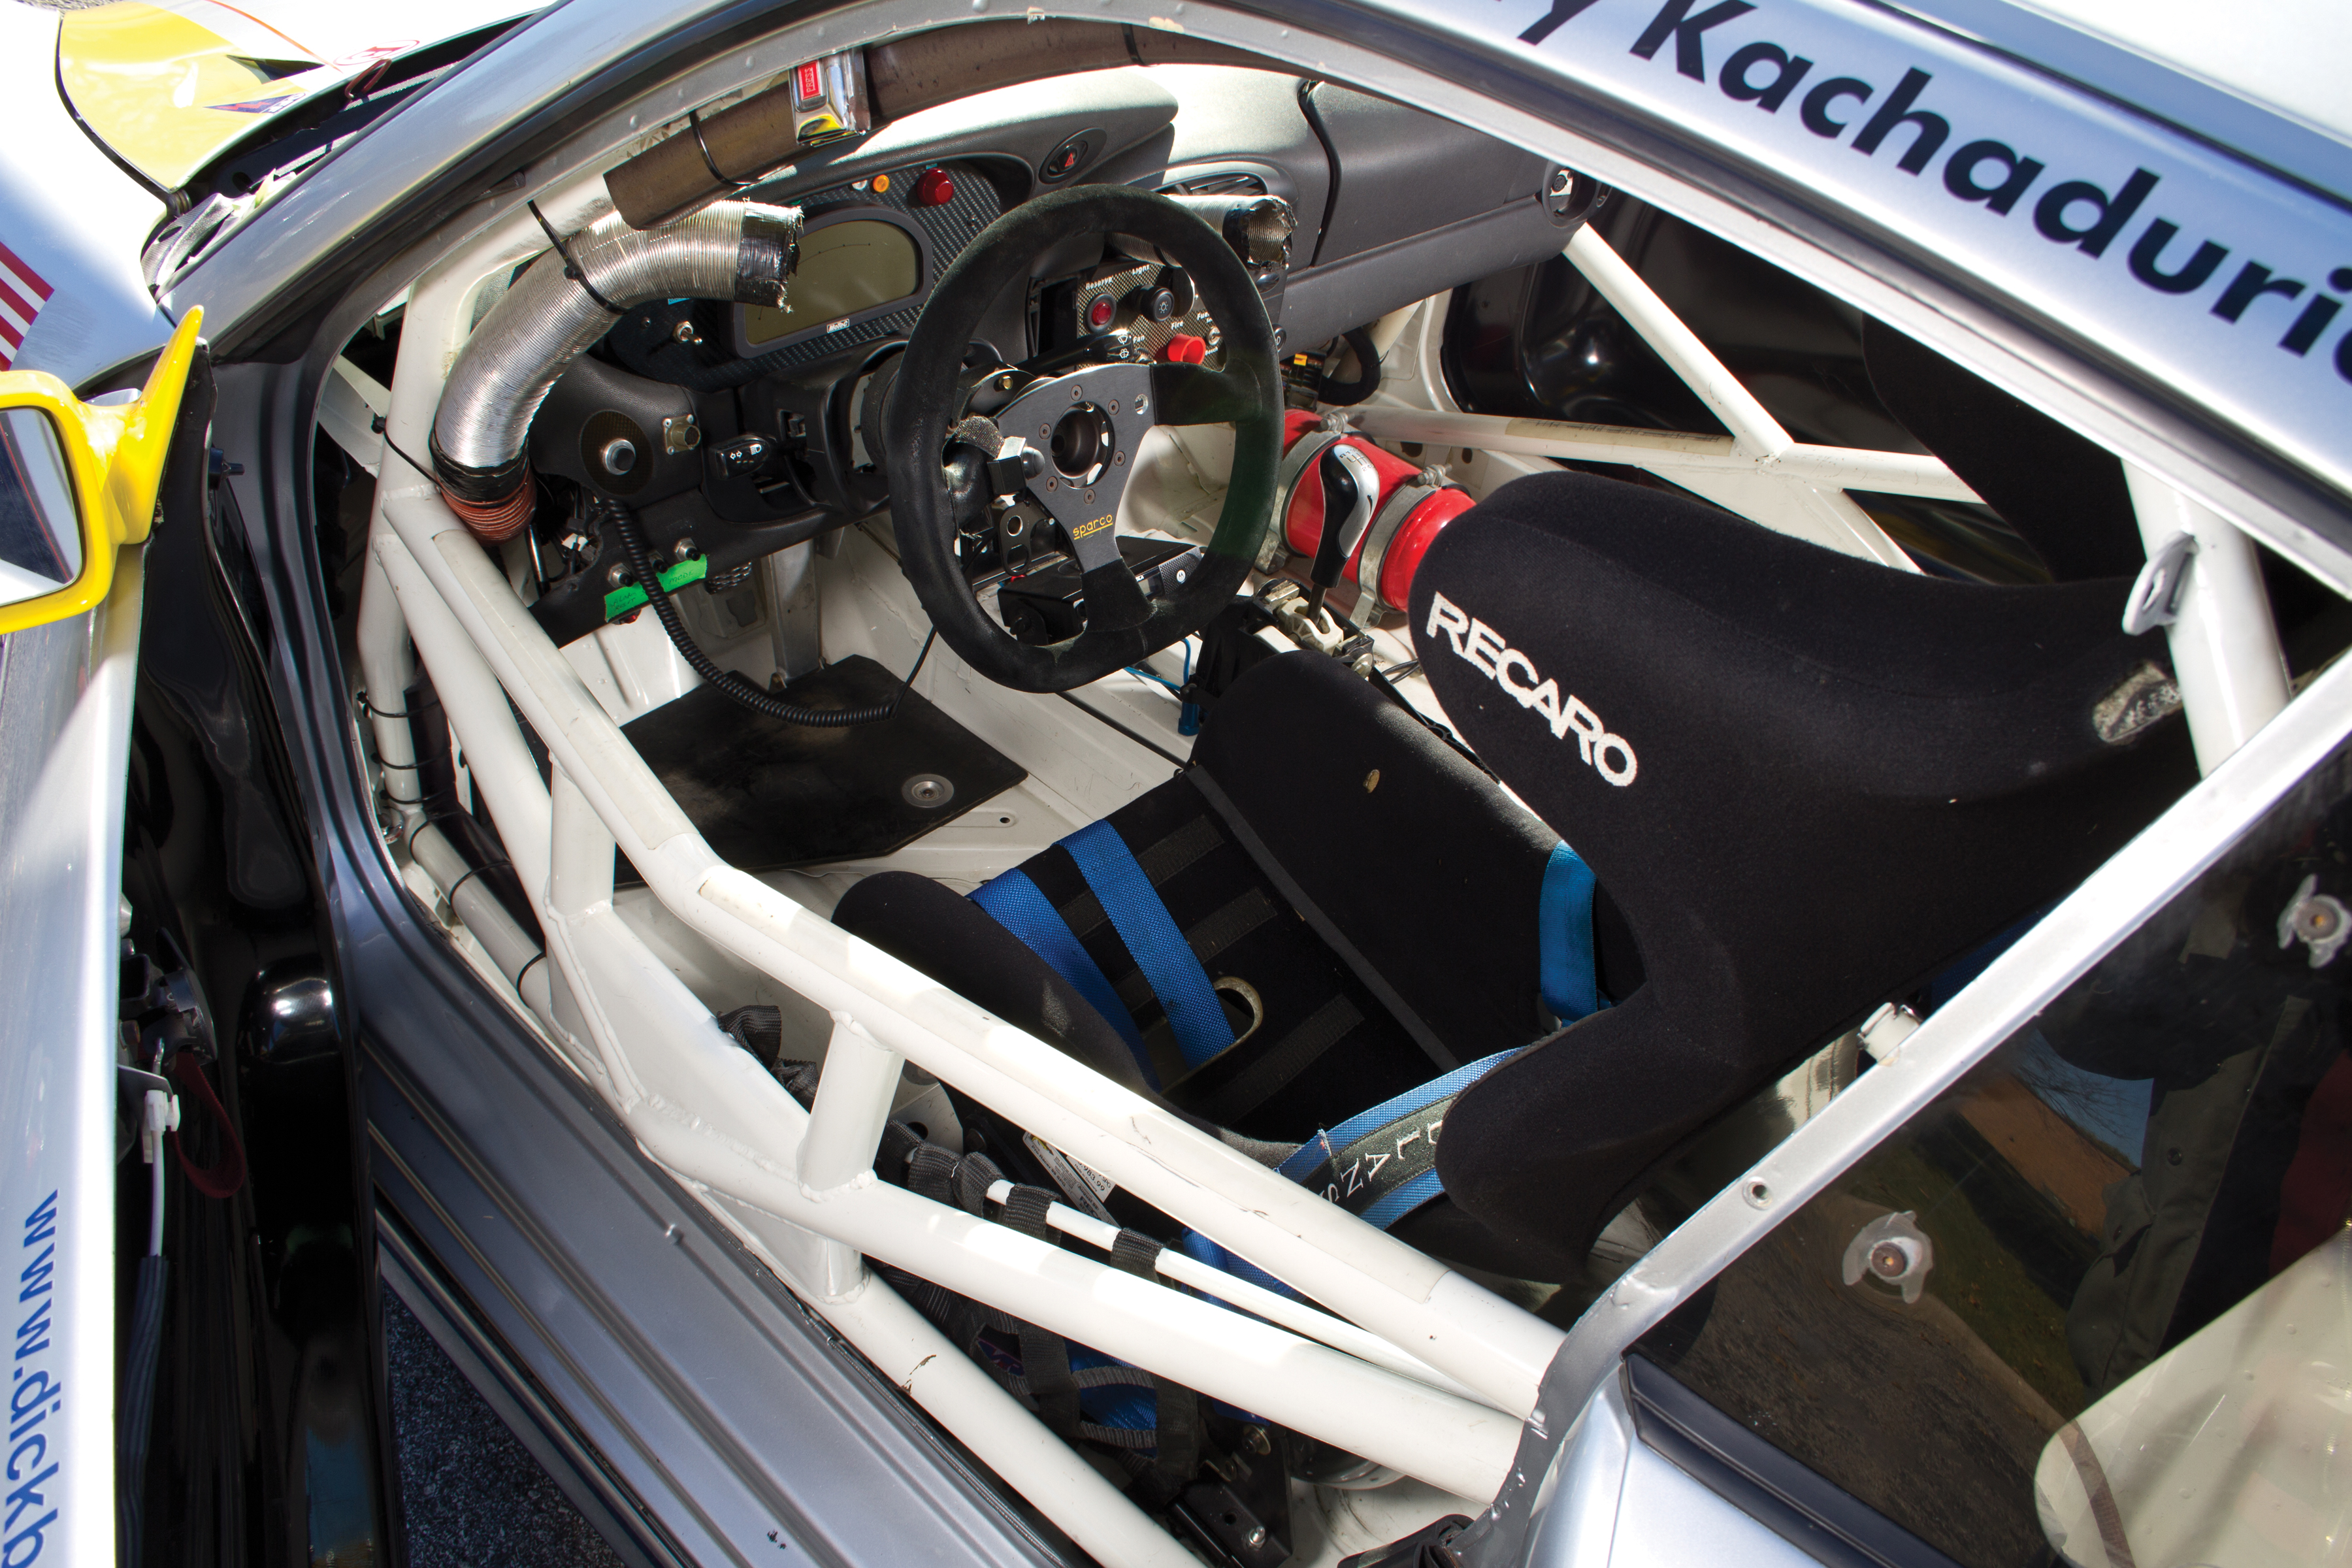 Porsche GT R Build Race Party - Porsche club racing